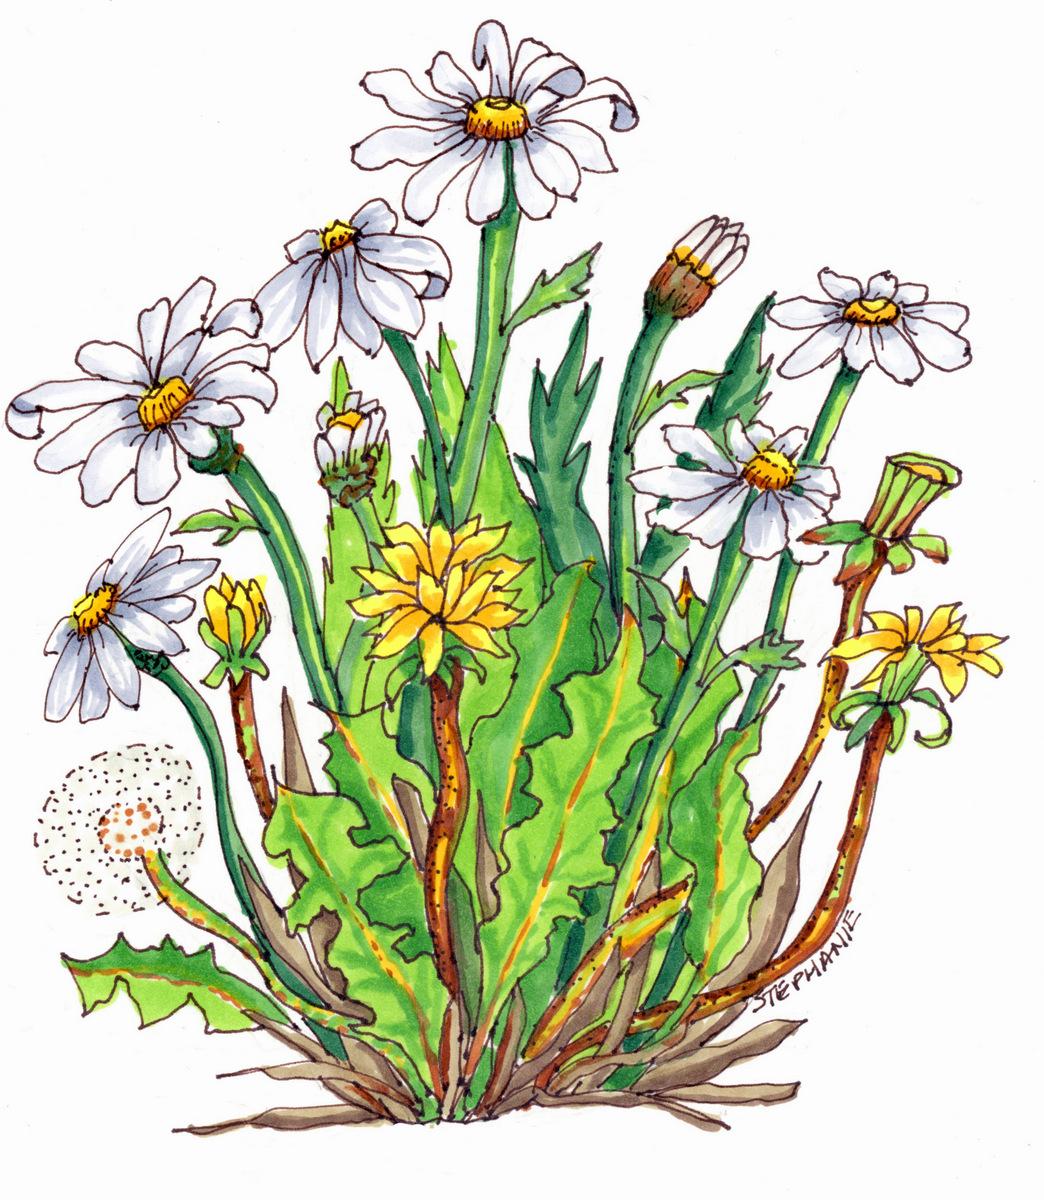 06-Nature Illustration, Stephanie Sipp, Flowers-006.jpg